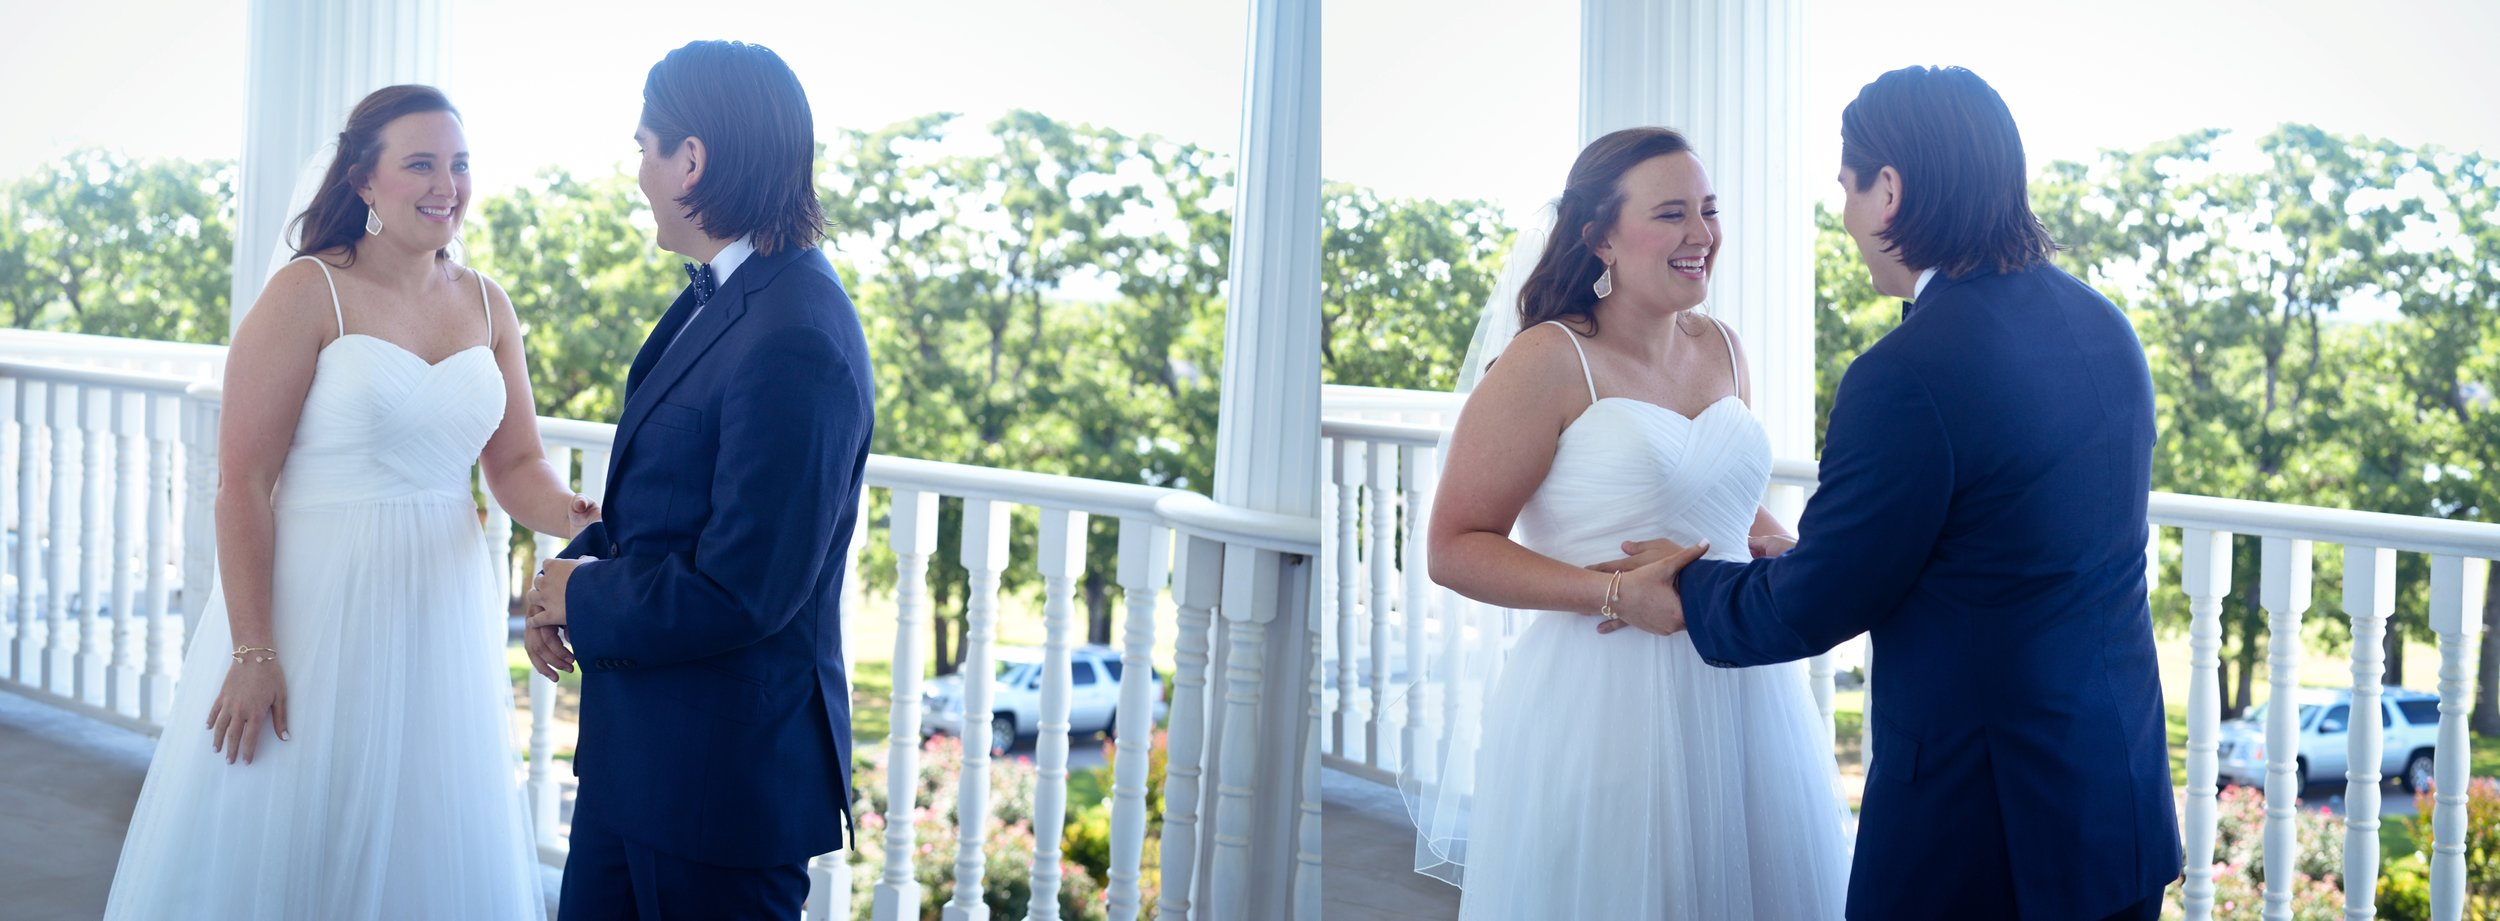 Lonestar-Mansion-Fort-Worth-Wedding-Planner-Burleson-Wedding-Venue_10.jpg